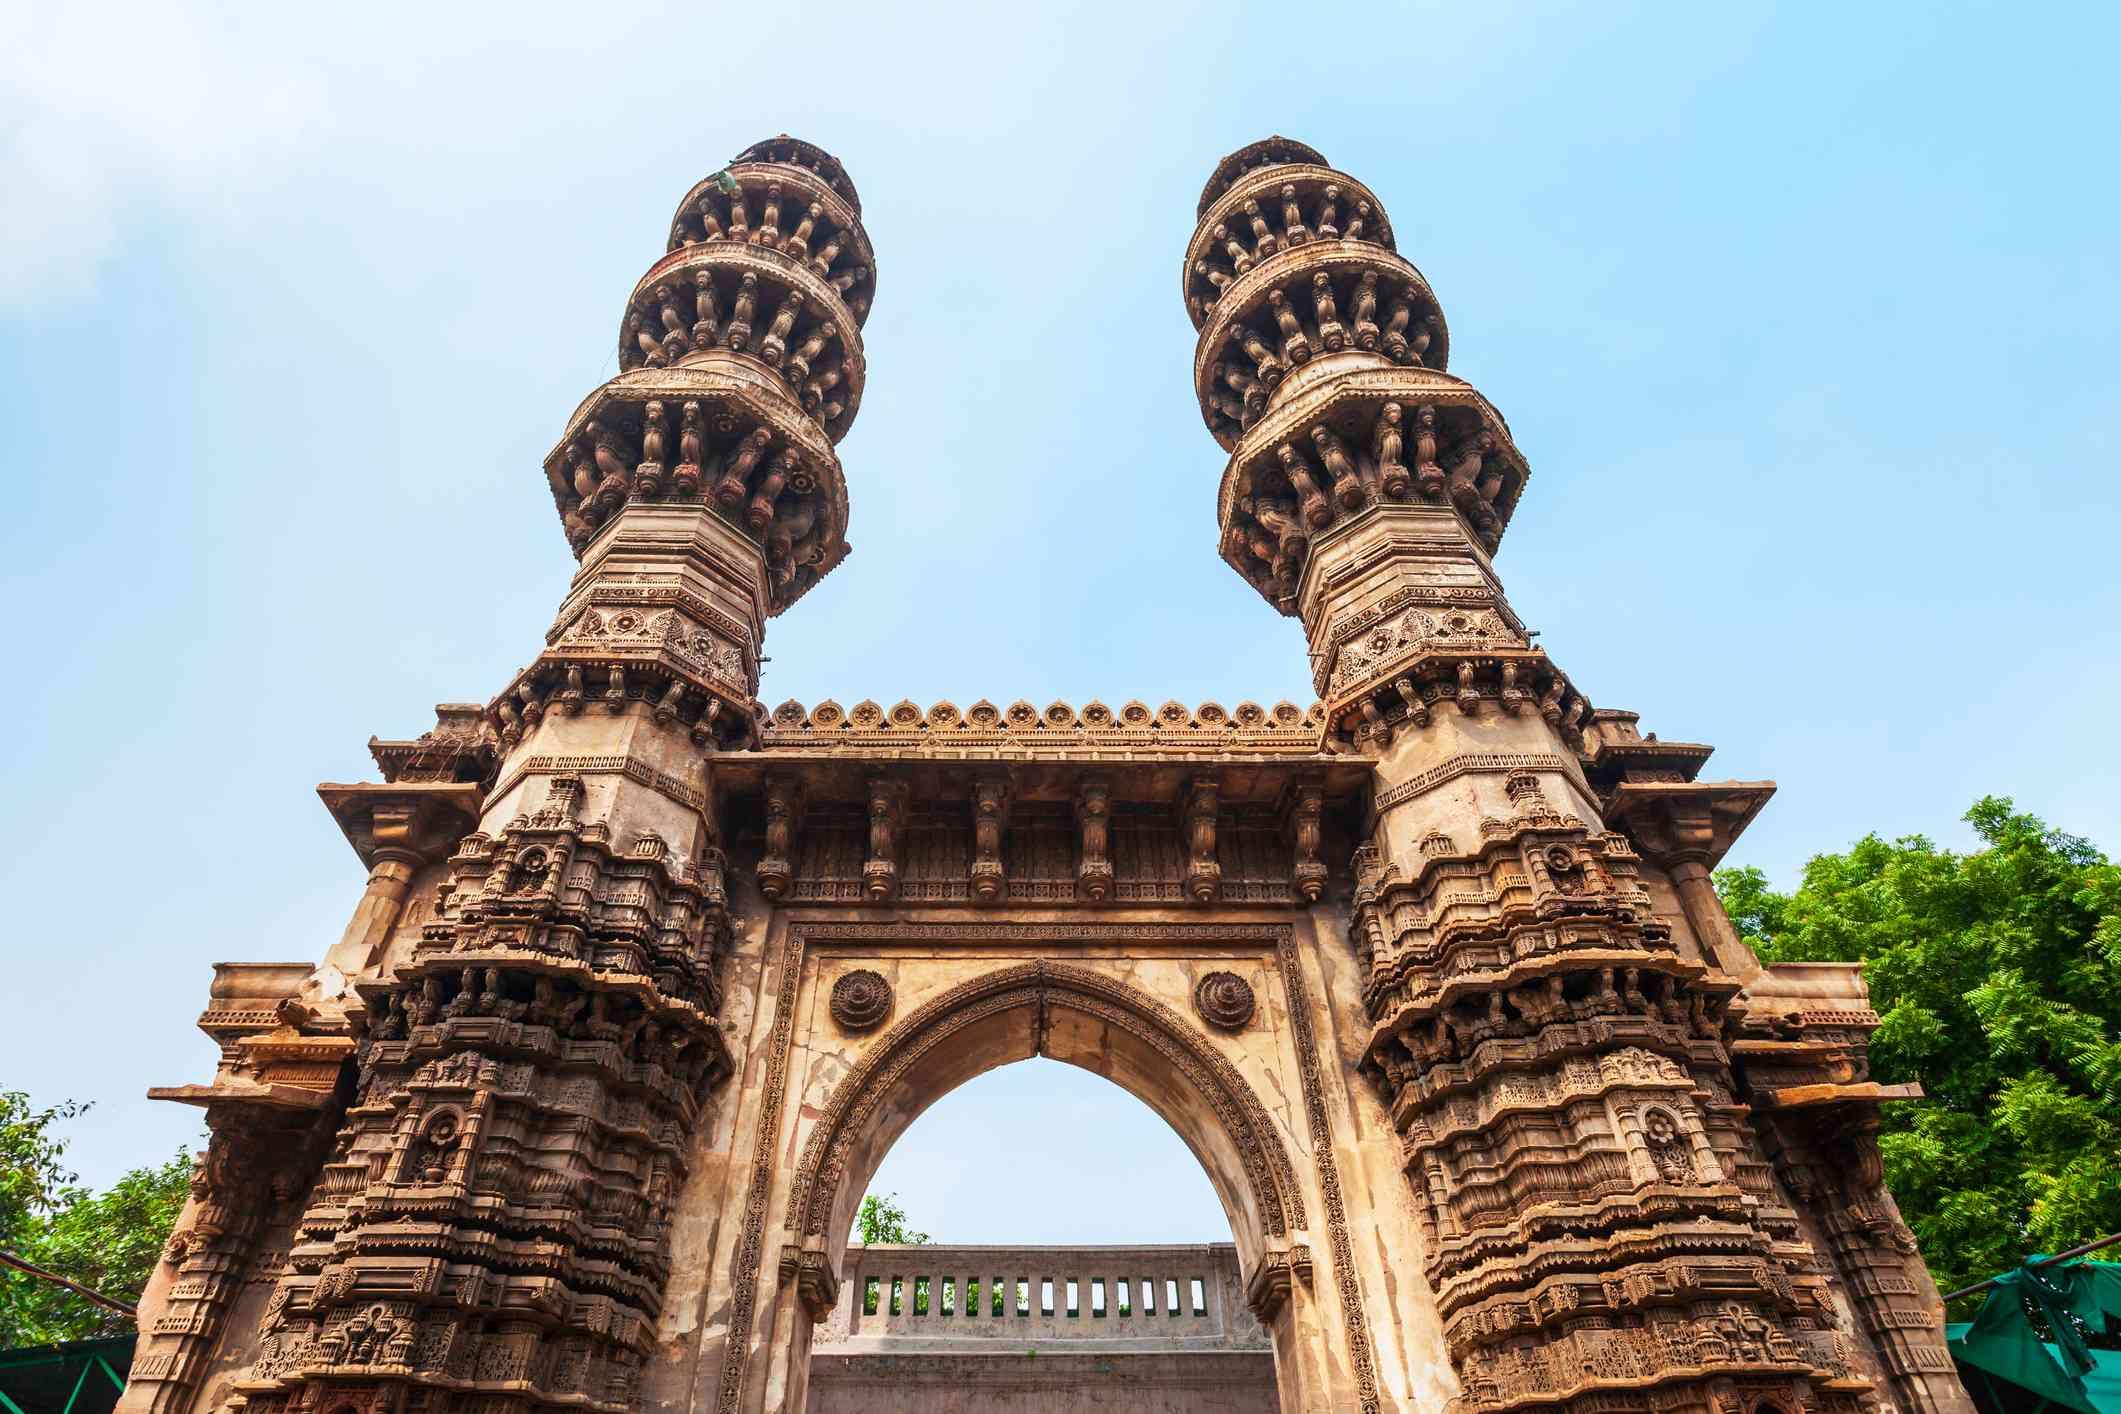 Sidi Bashir Mosque in Ahmedabad